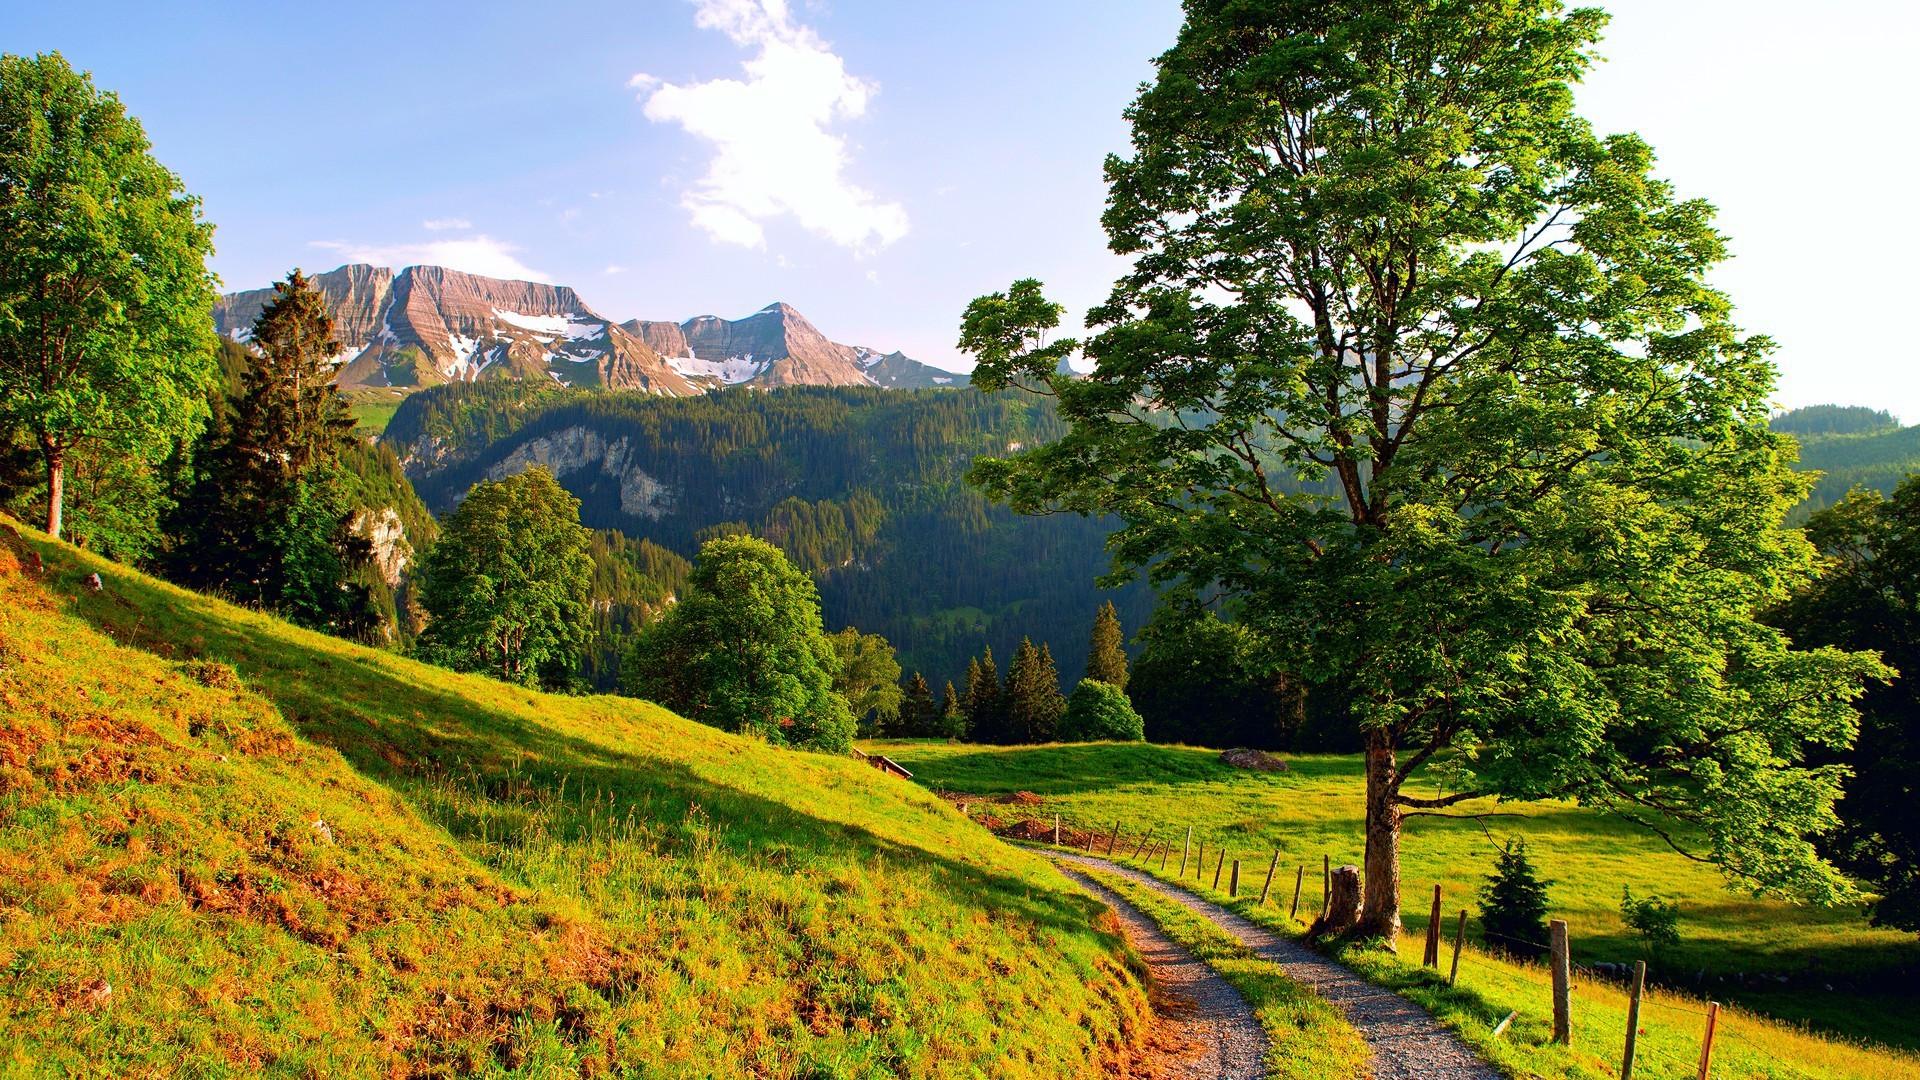 Картинки с летним пейзажем